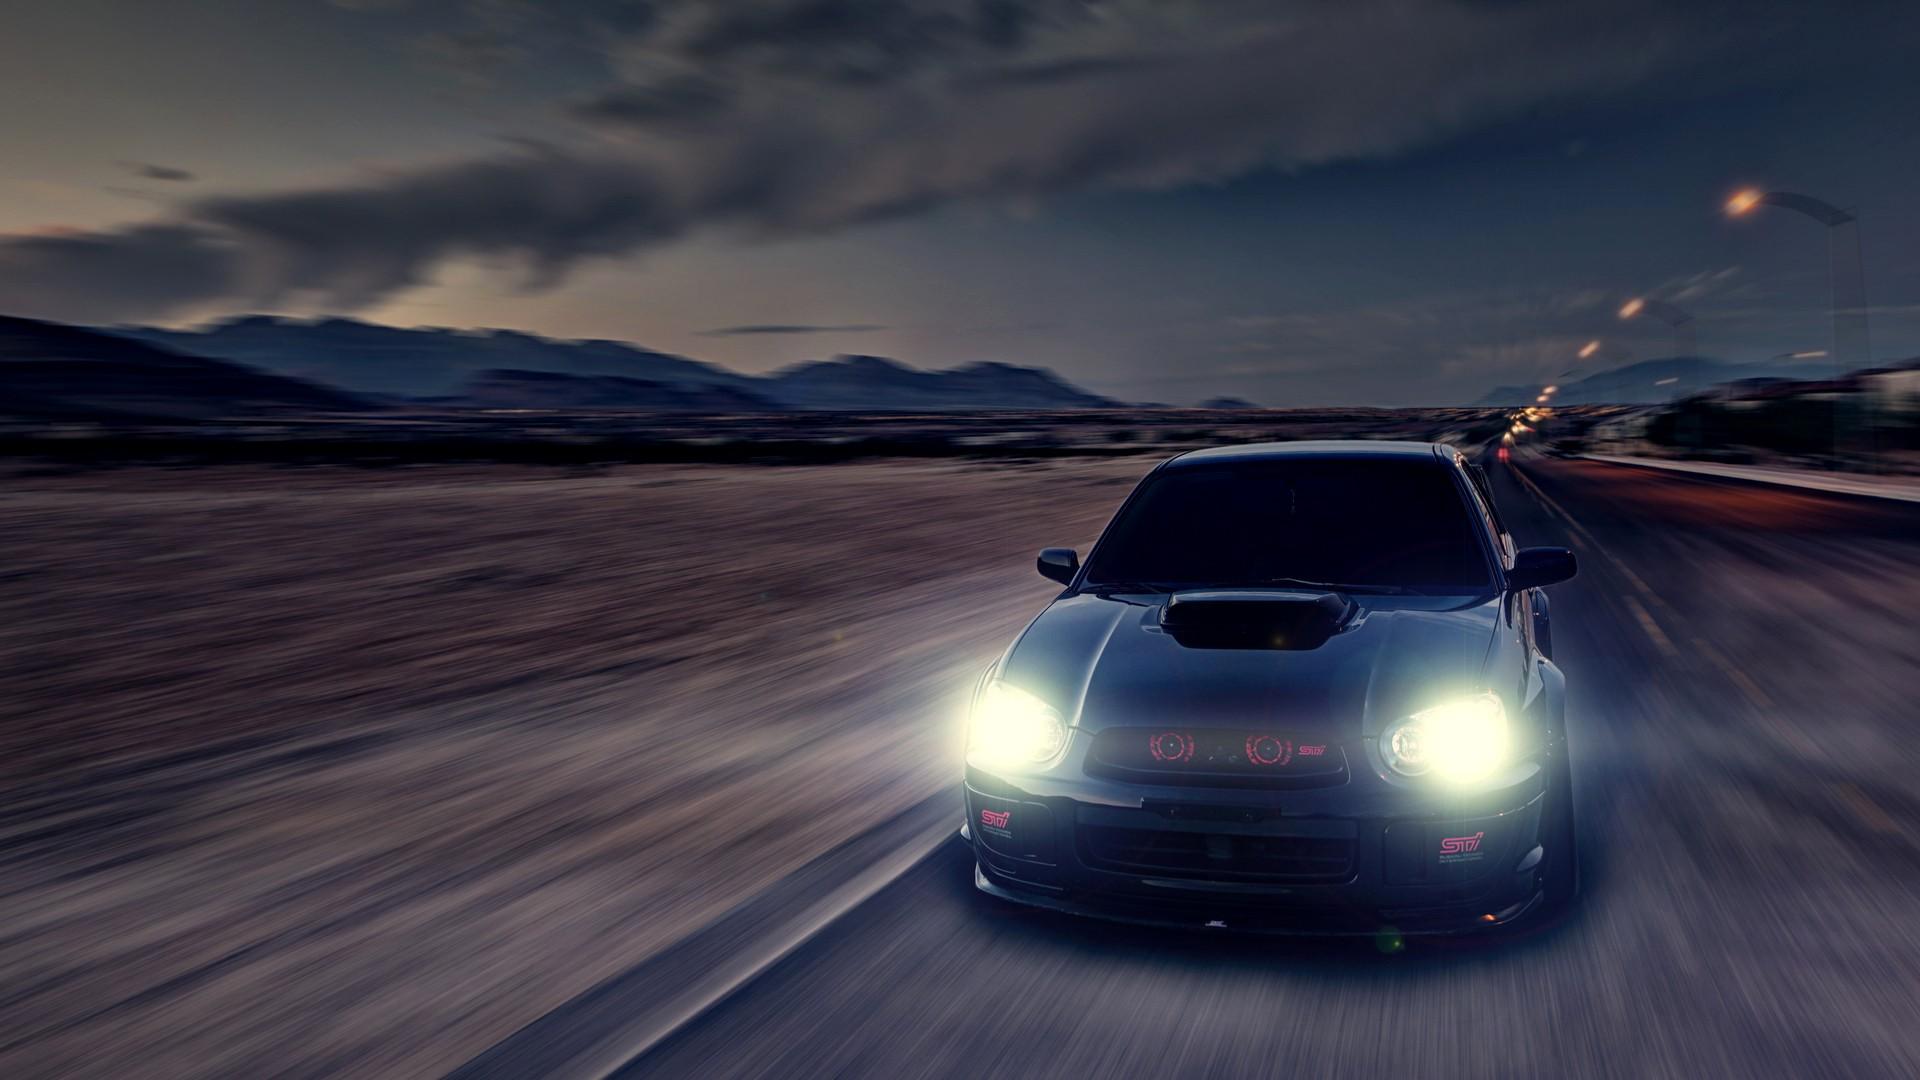 Cool Cars Drifting Wallpapers Hd Jdm Wallpapers 60 Wallpapers Adorable Wallpapers